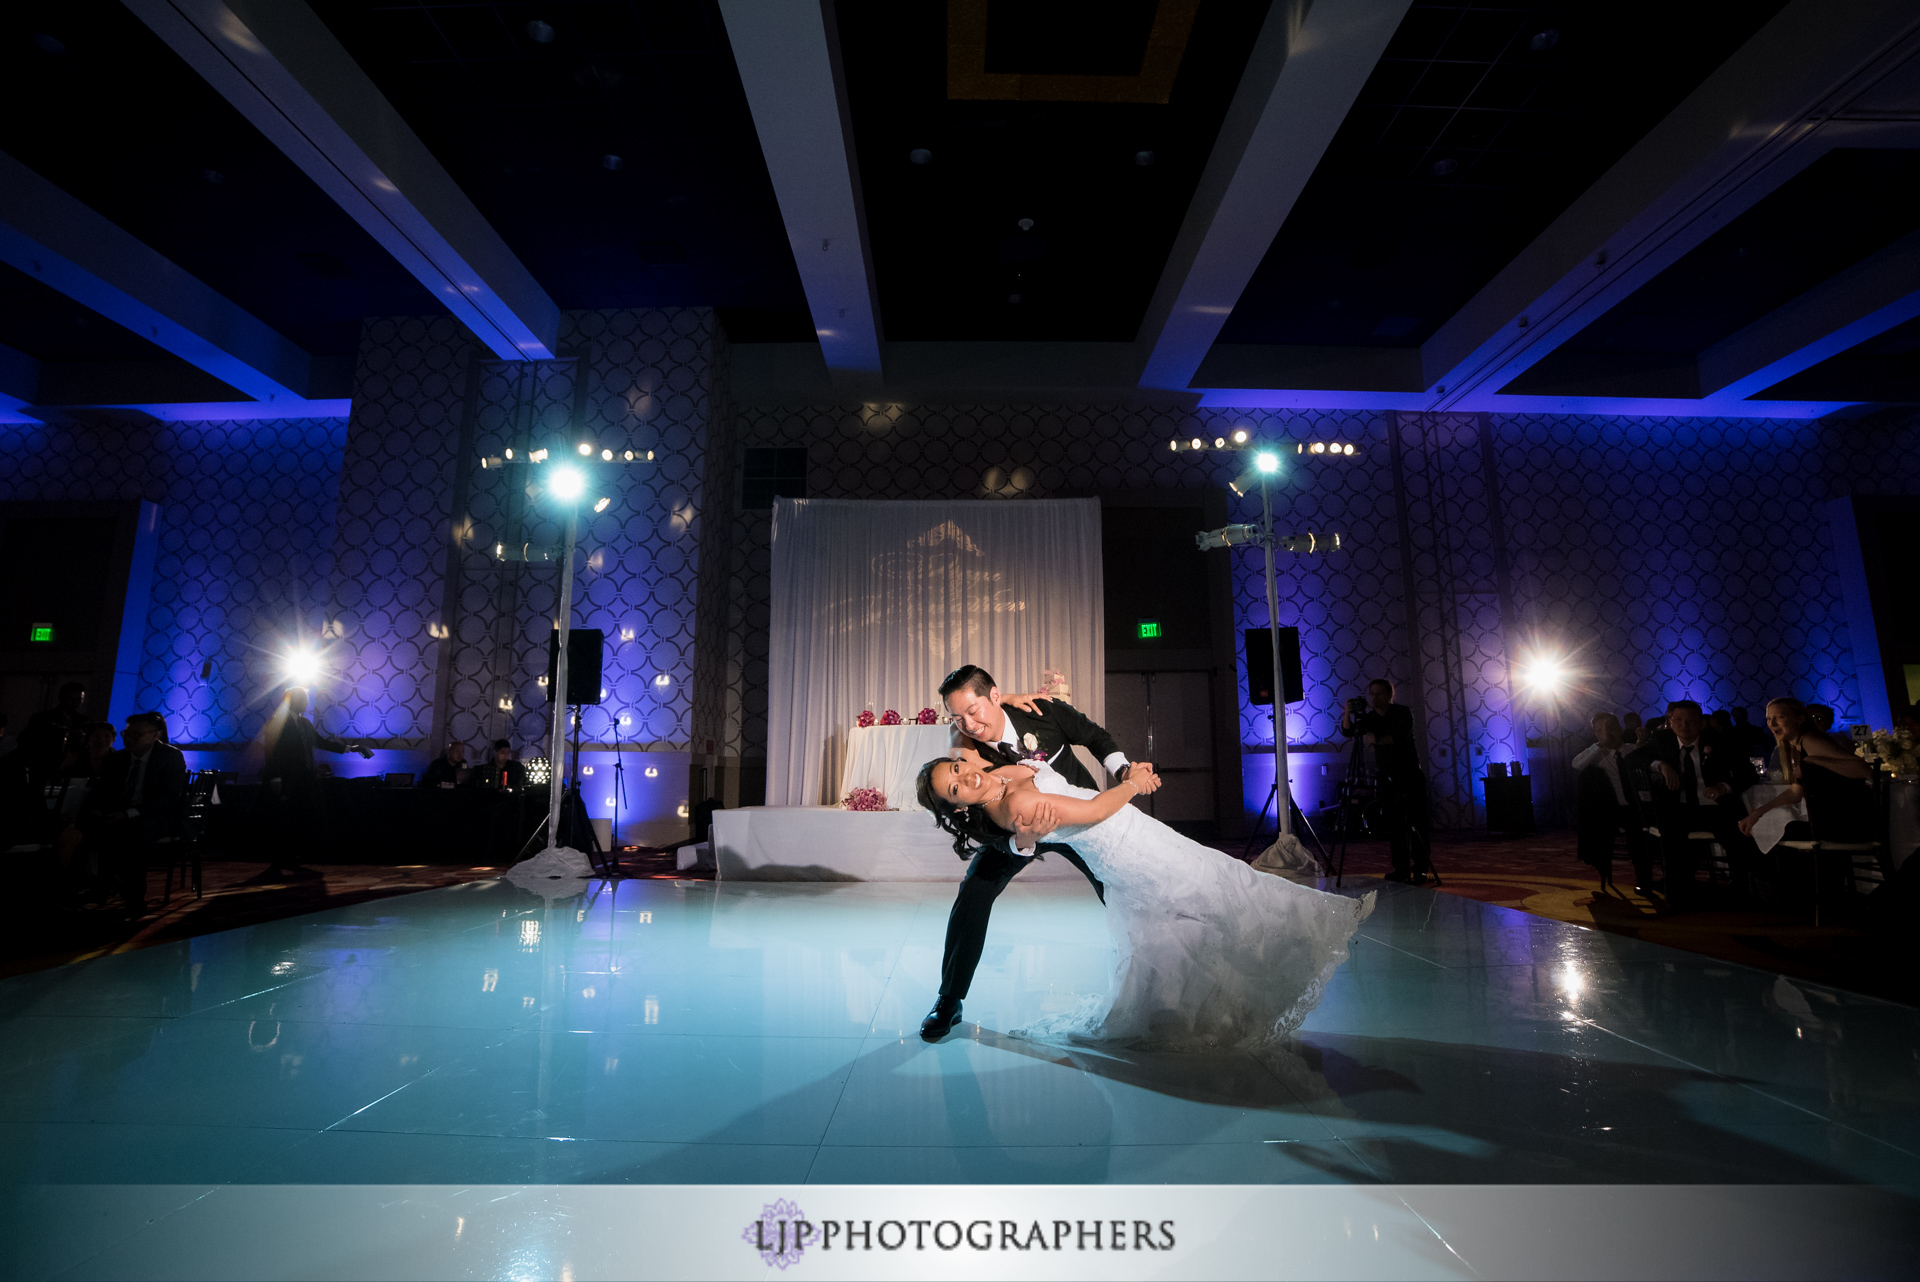 28-jw-marriott-los-angeles-wedding-photographer-wedding-reception-photos